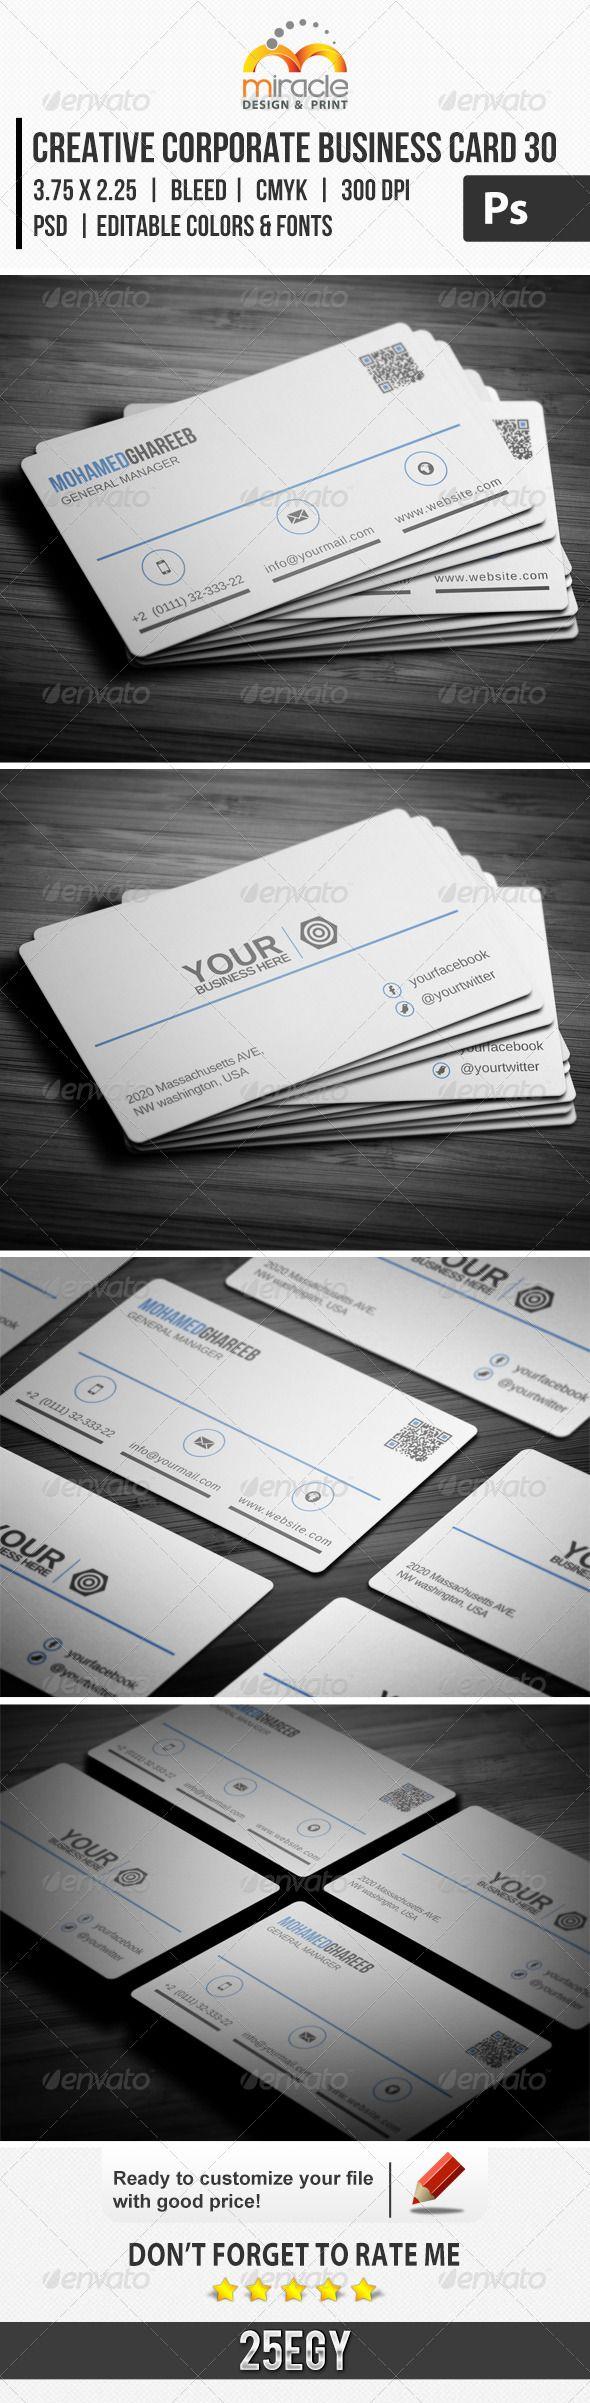 Excellent Lock Pick Business Card Ideas - Business Card Ideas ...